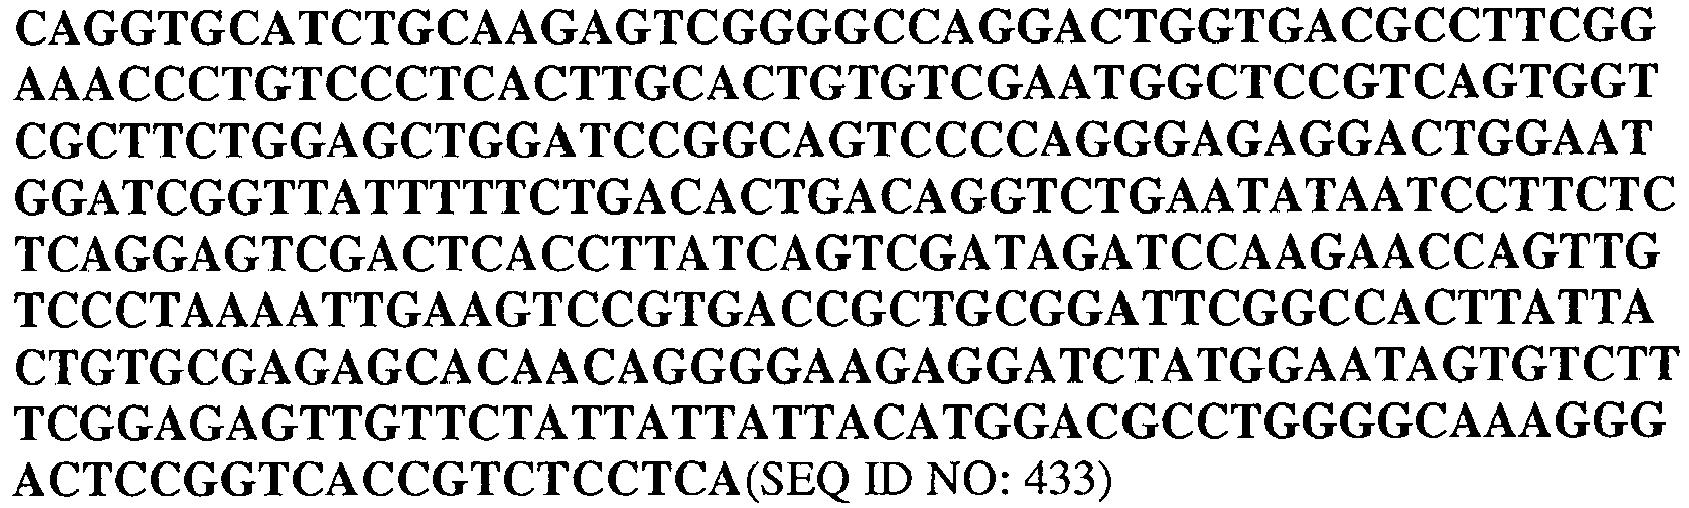 Figure imgb0319